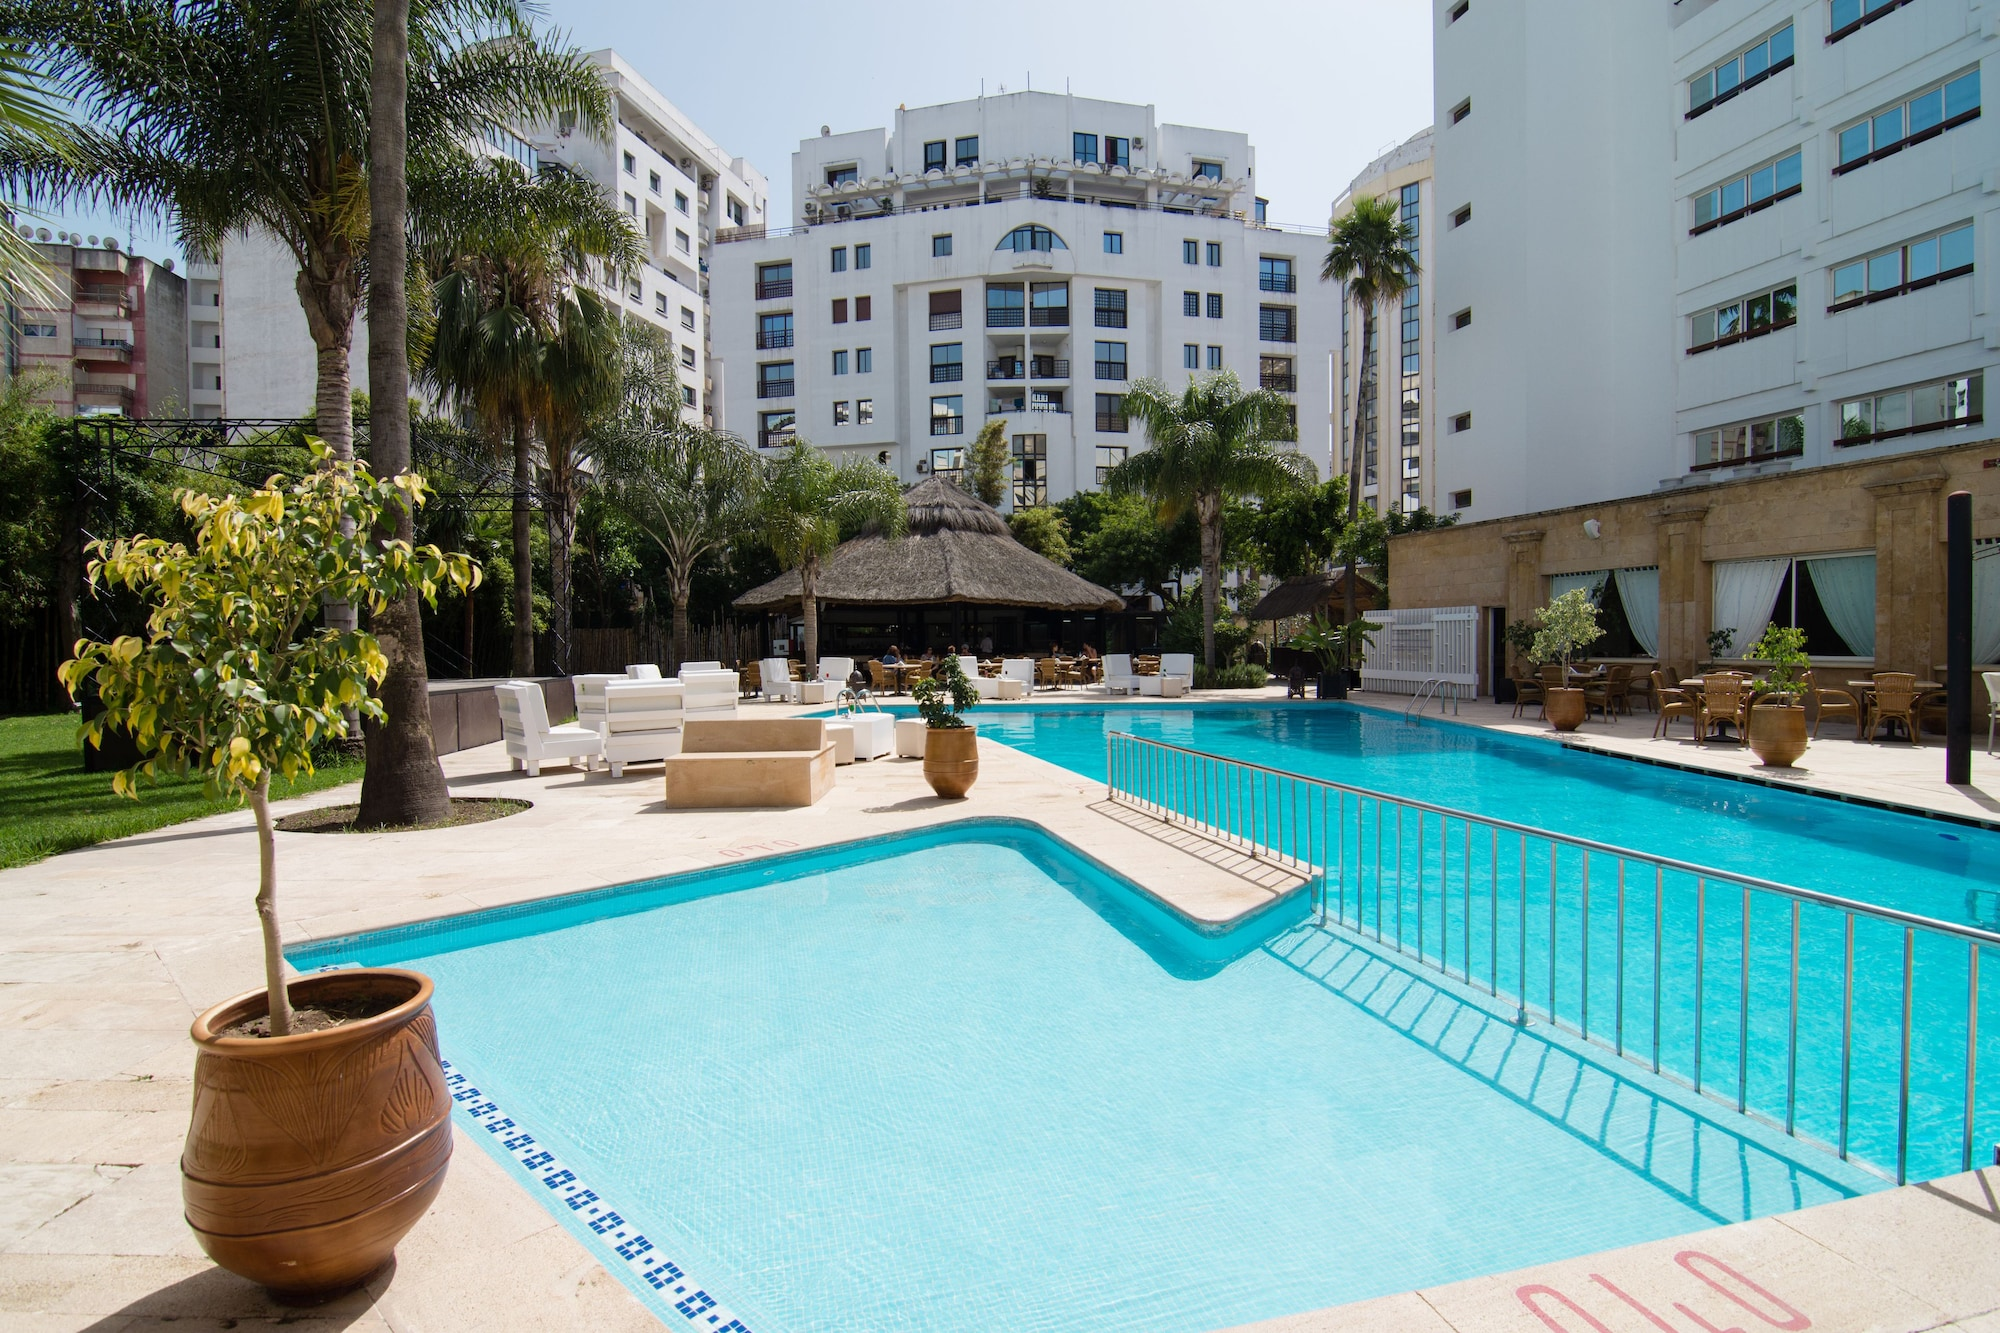 Hotel El Oumnia Puerto, Tanger-Assilah